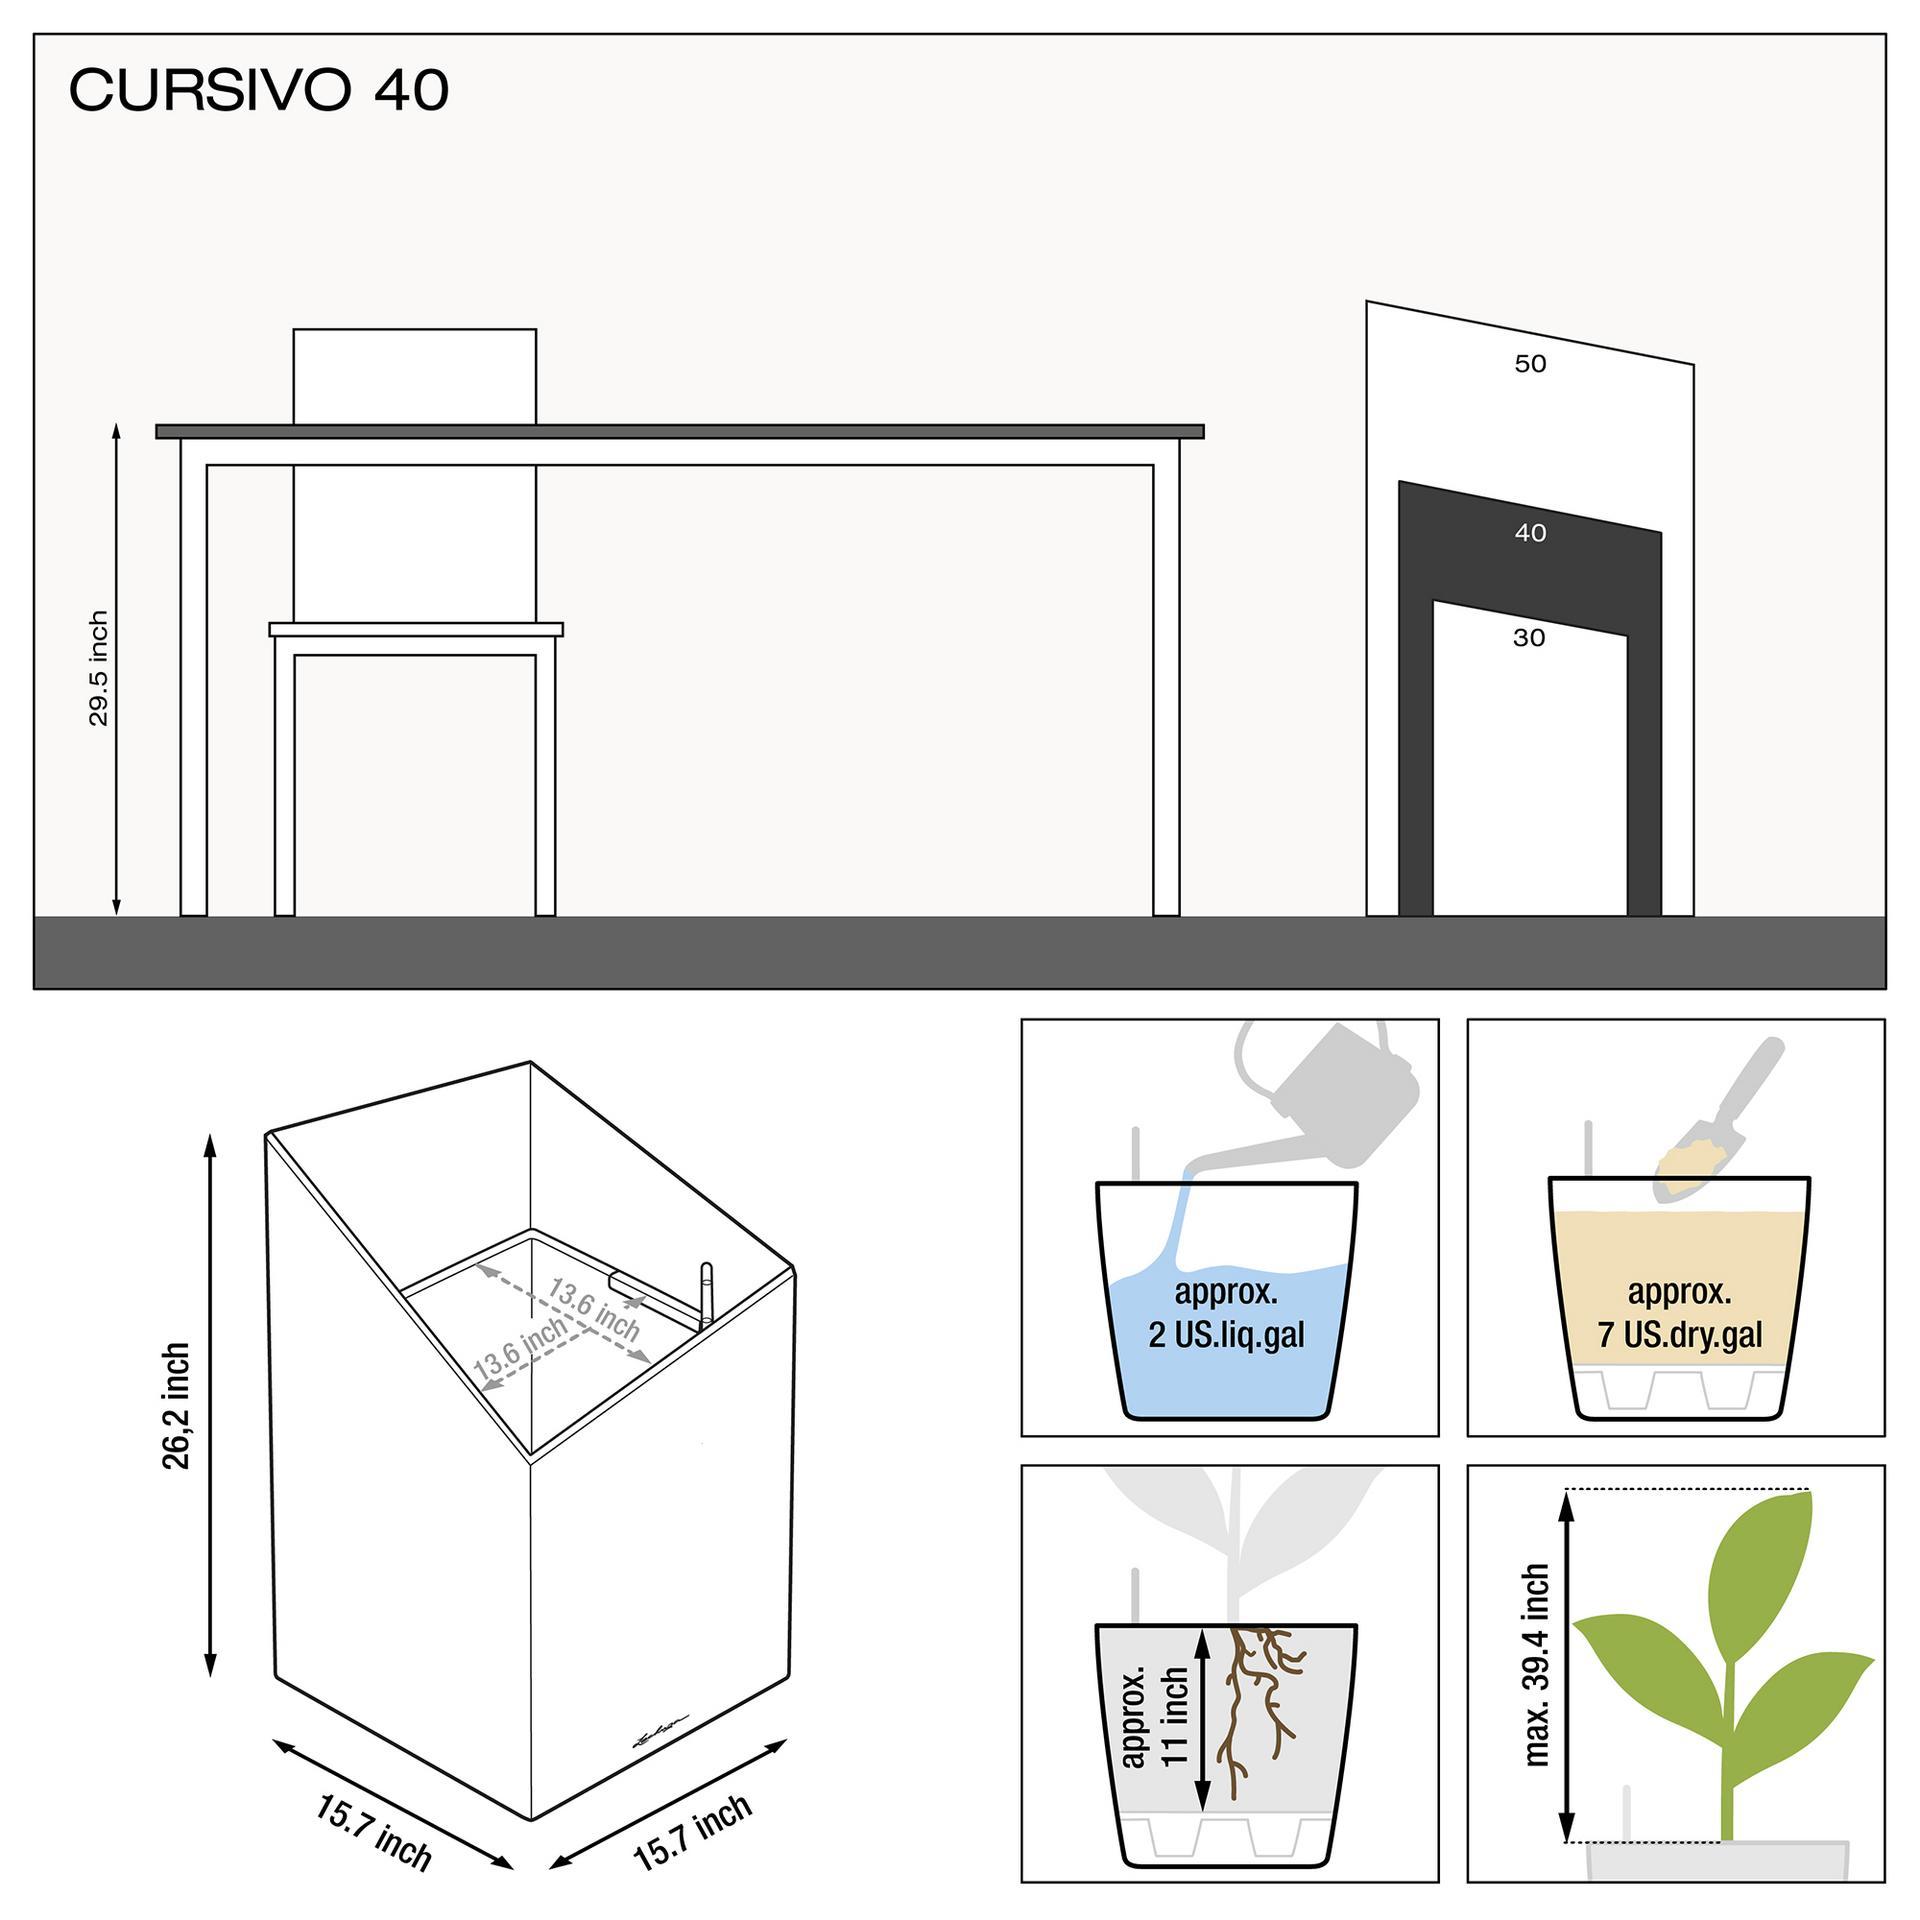 le_cursivo40_product_addi_nz_us